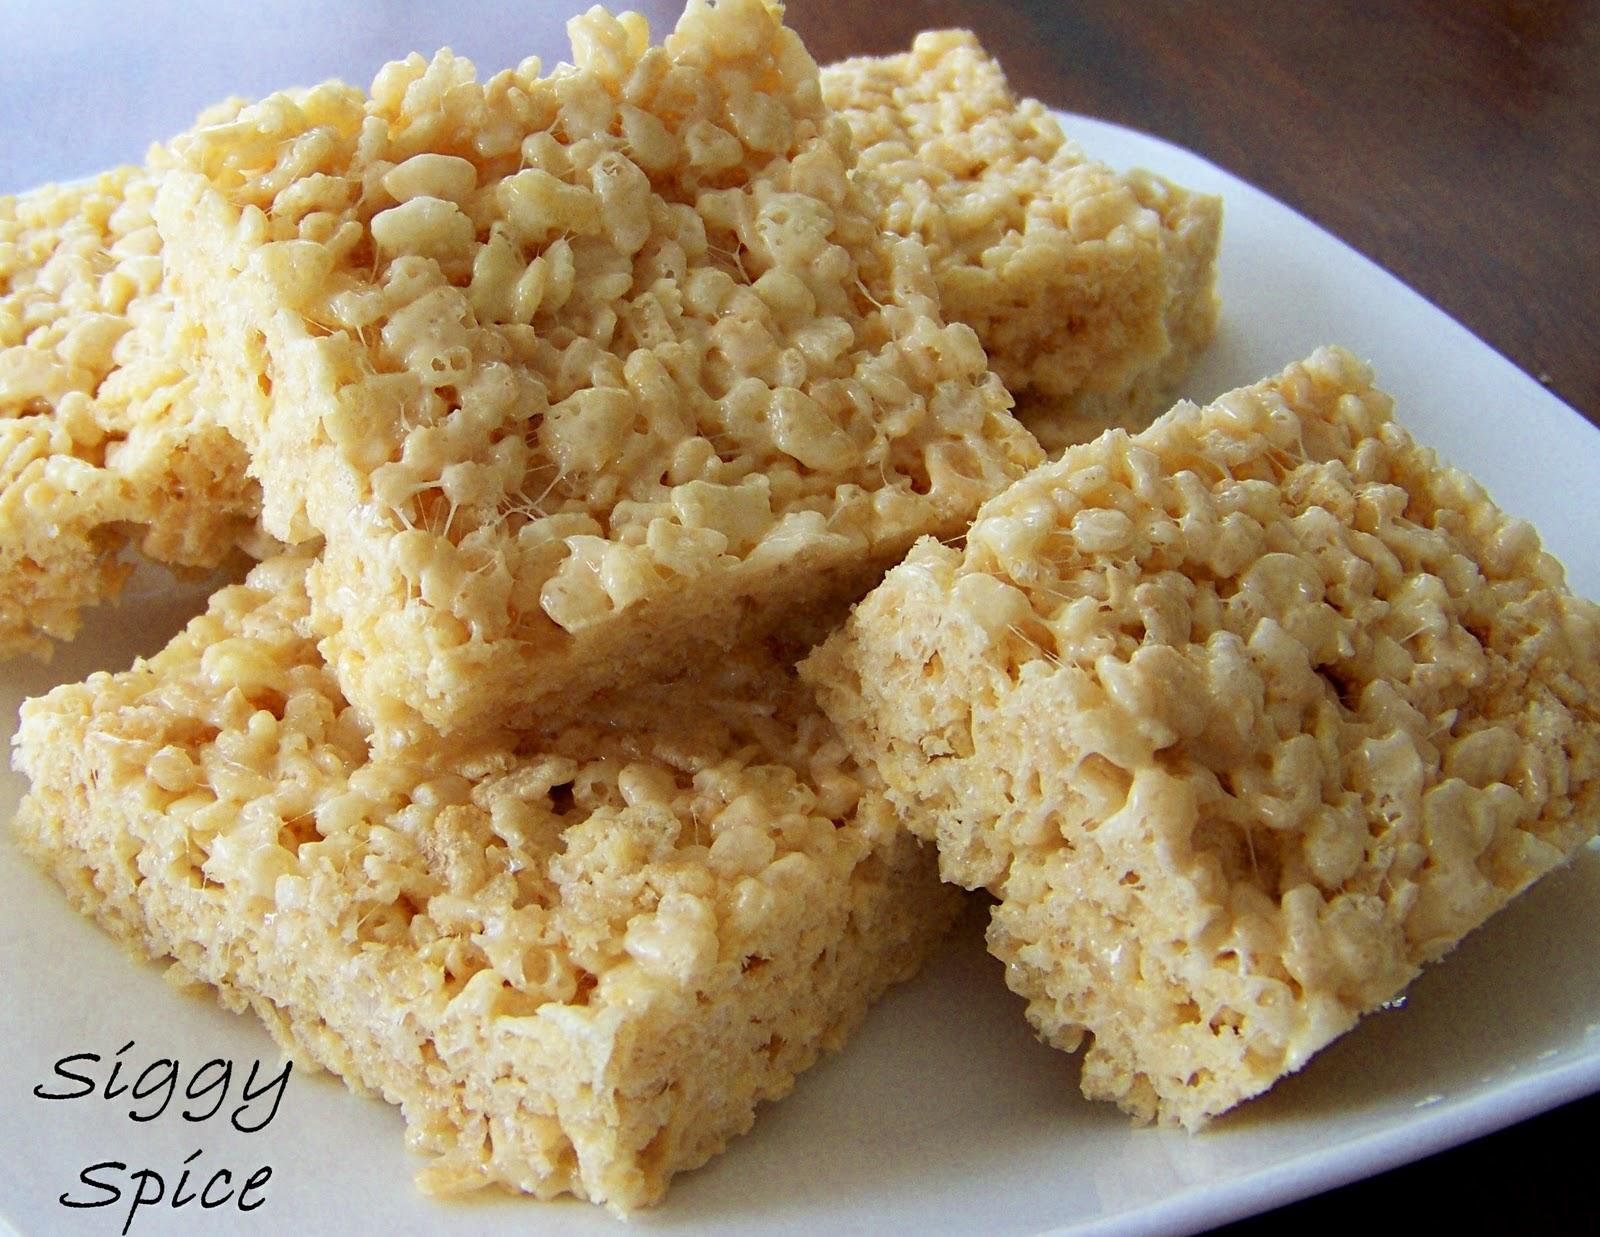 Siggy Spice: Brown Butter Sea Salt Rice Krispy Treats